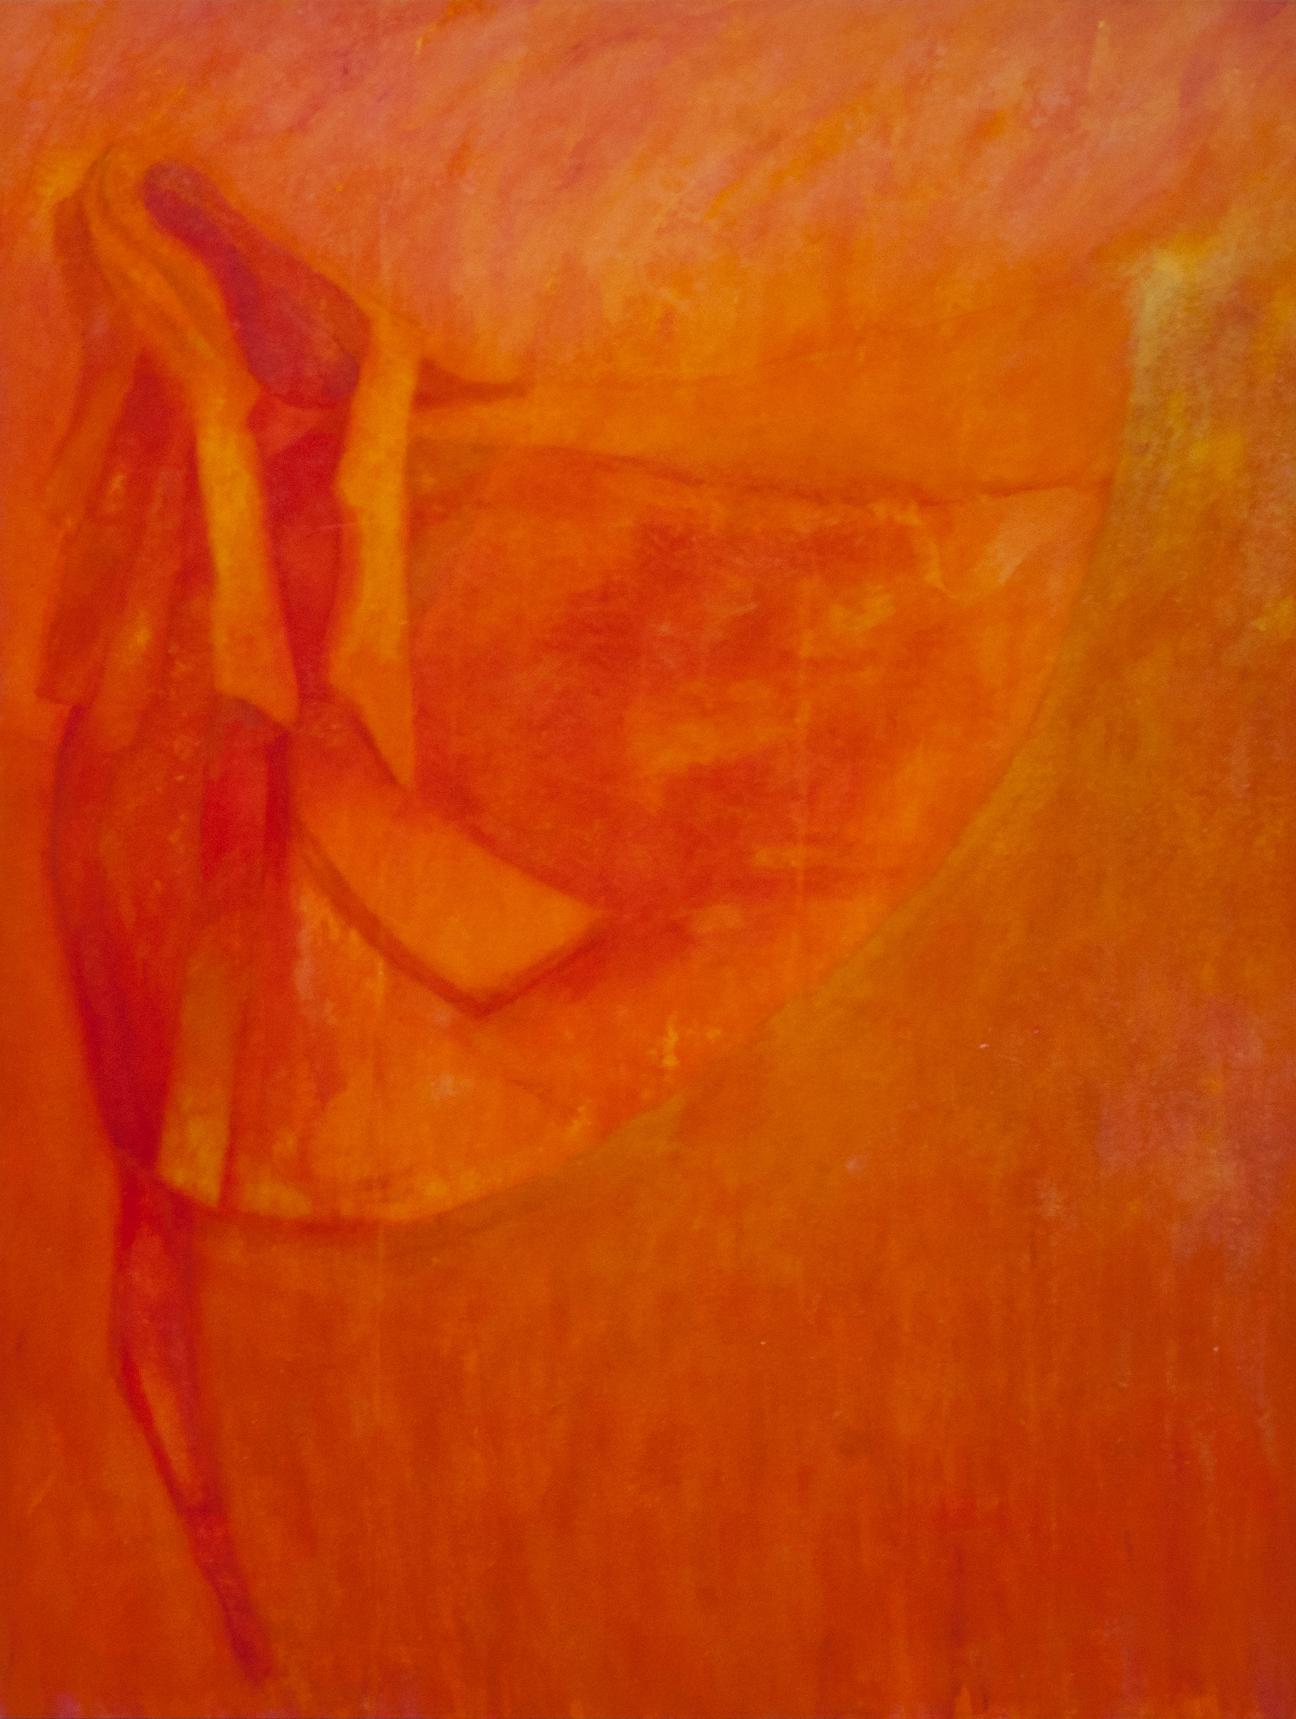 Early Morning 1. 2012 Acrylic on calico 160 x 120cm